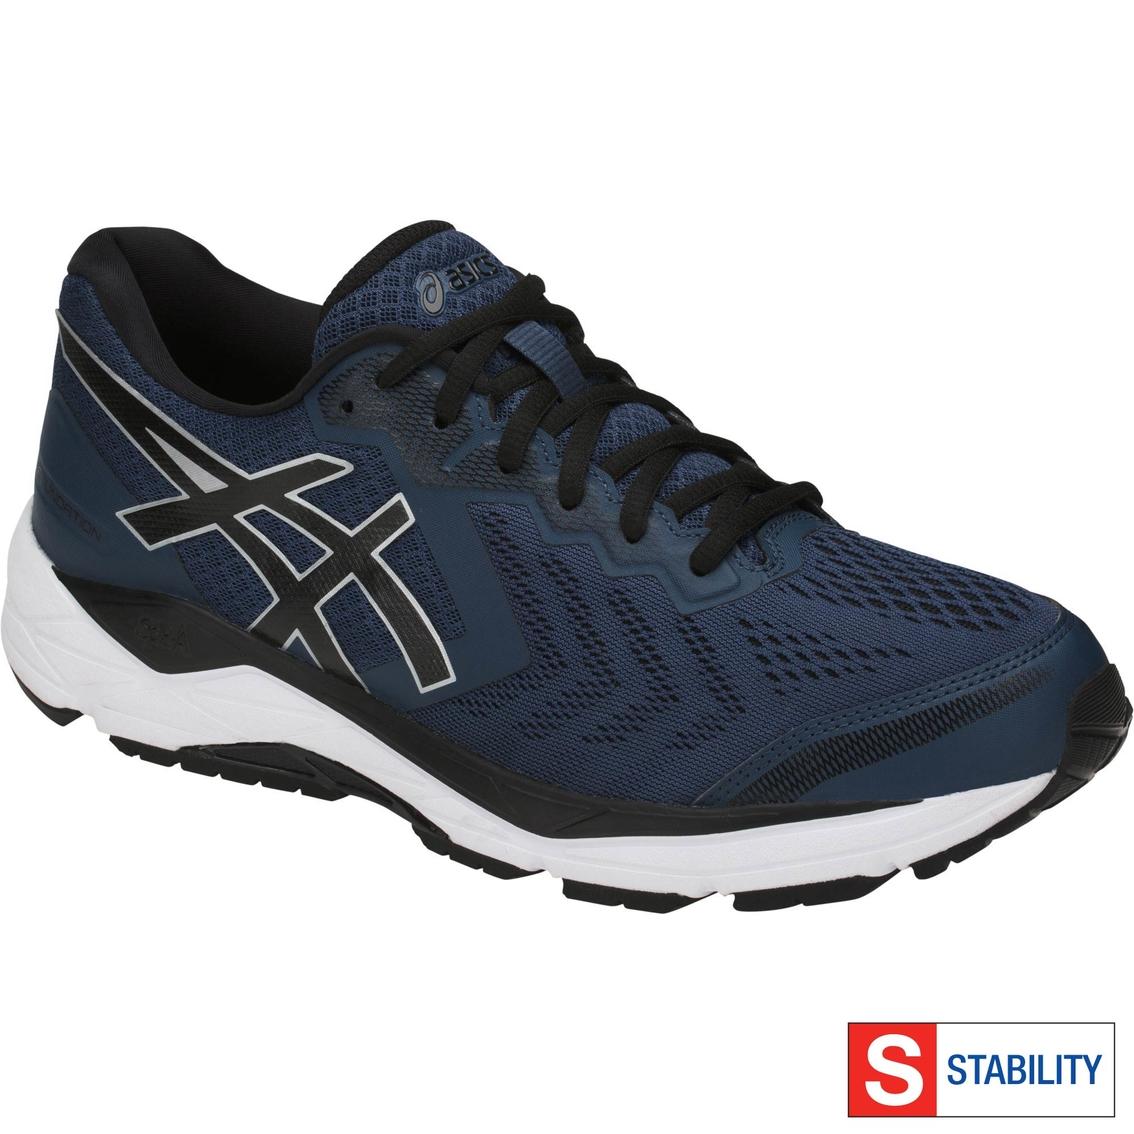 ASICS Men's GEL Foundation 13 Athletic Shoes